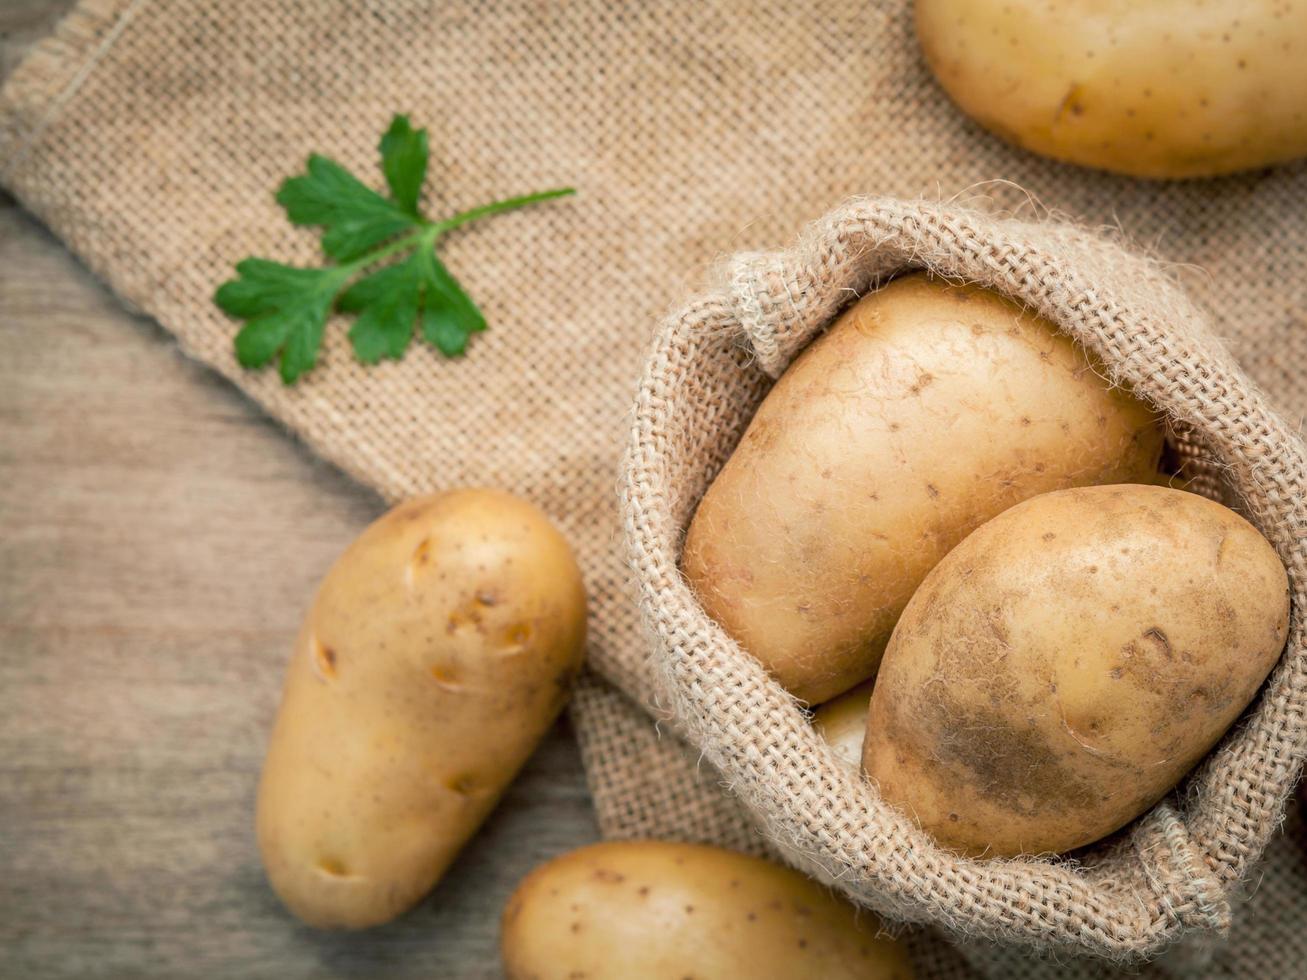 patatas frescas orgánicas foto